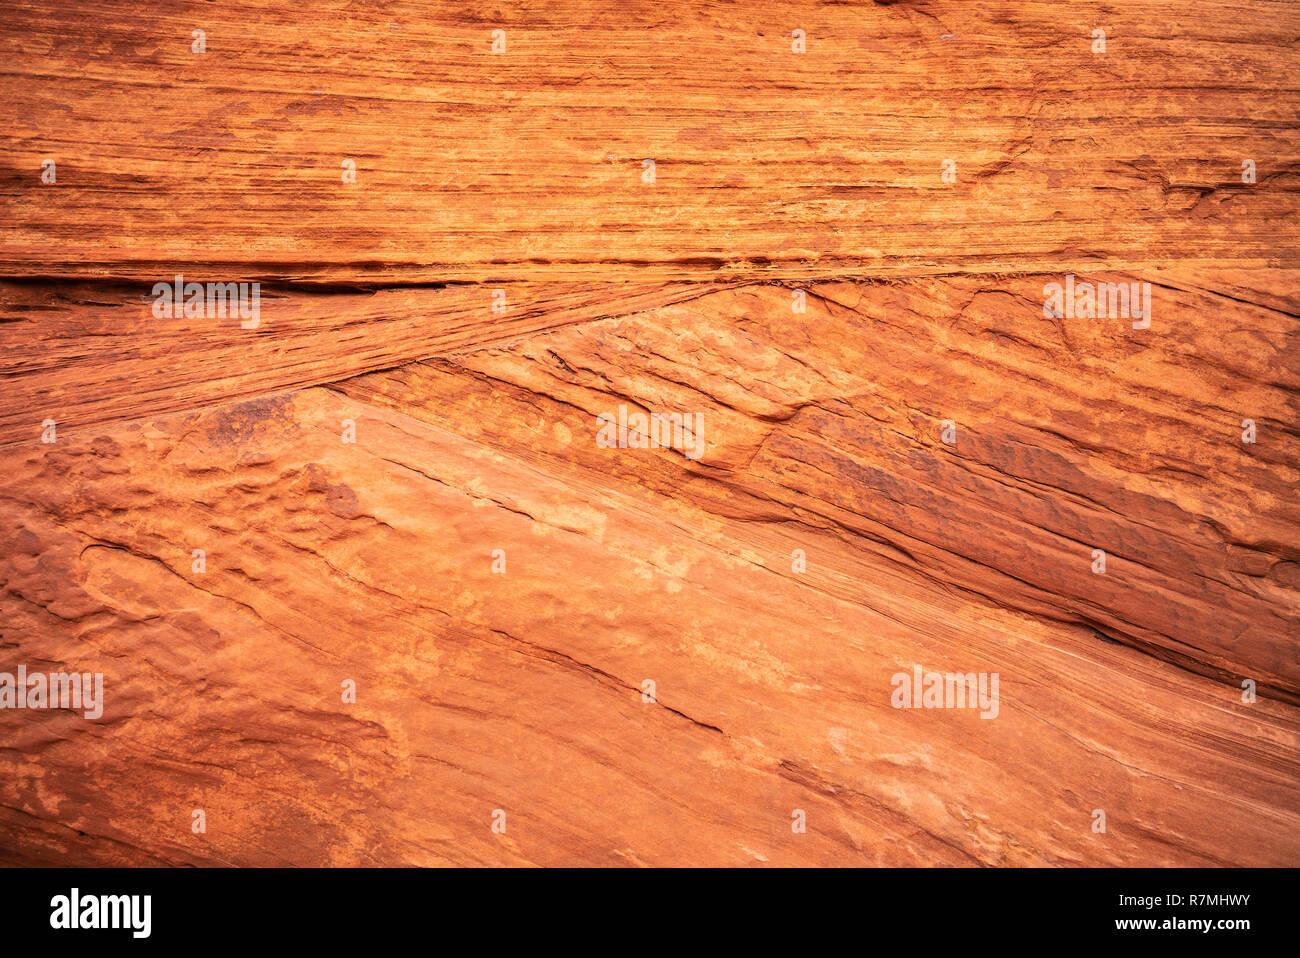 Waterhole Canyon - a slot canyon caused by flash flooding, cutting through the red Navajo sandstone rocks near Page, Arizona, USA Stock Photo